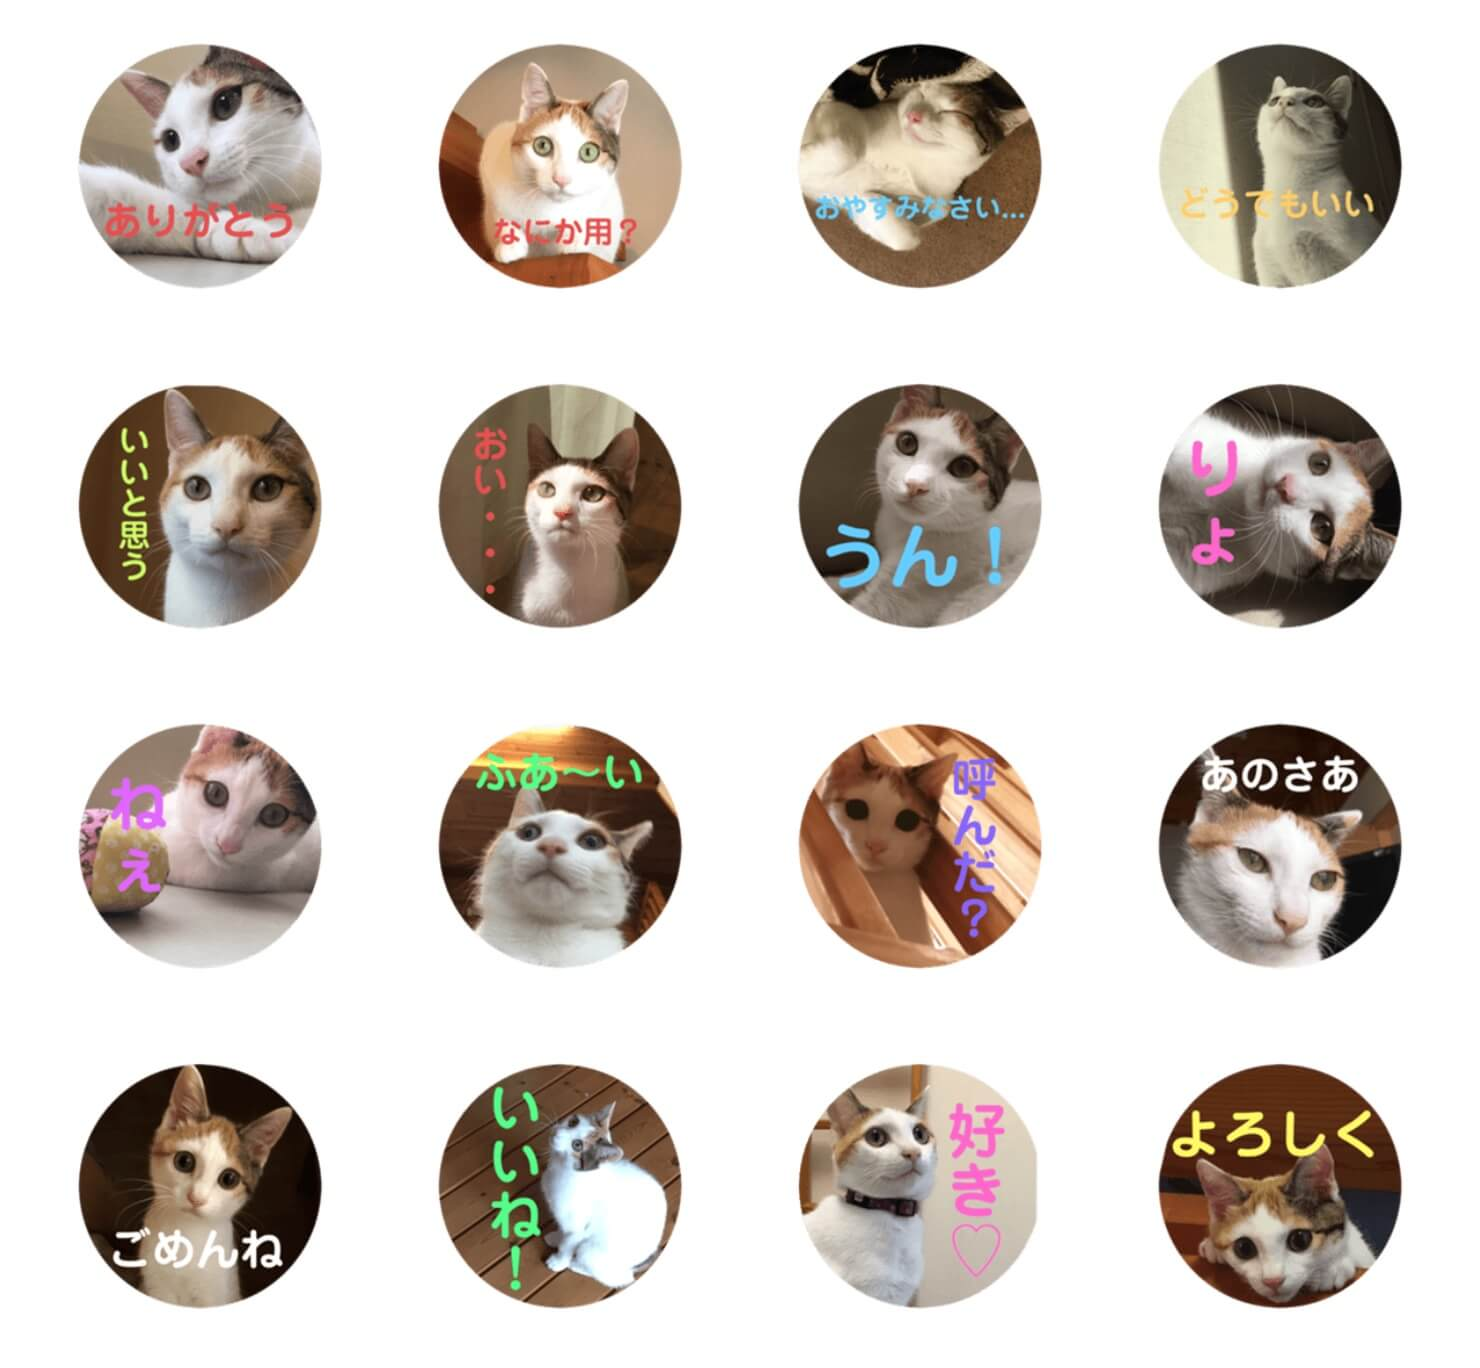 LINEスタンプ第2弾「三毛猫よろずスタンプ」が公開されました!